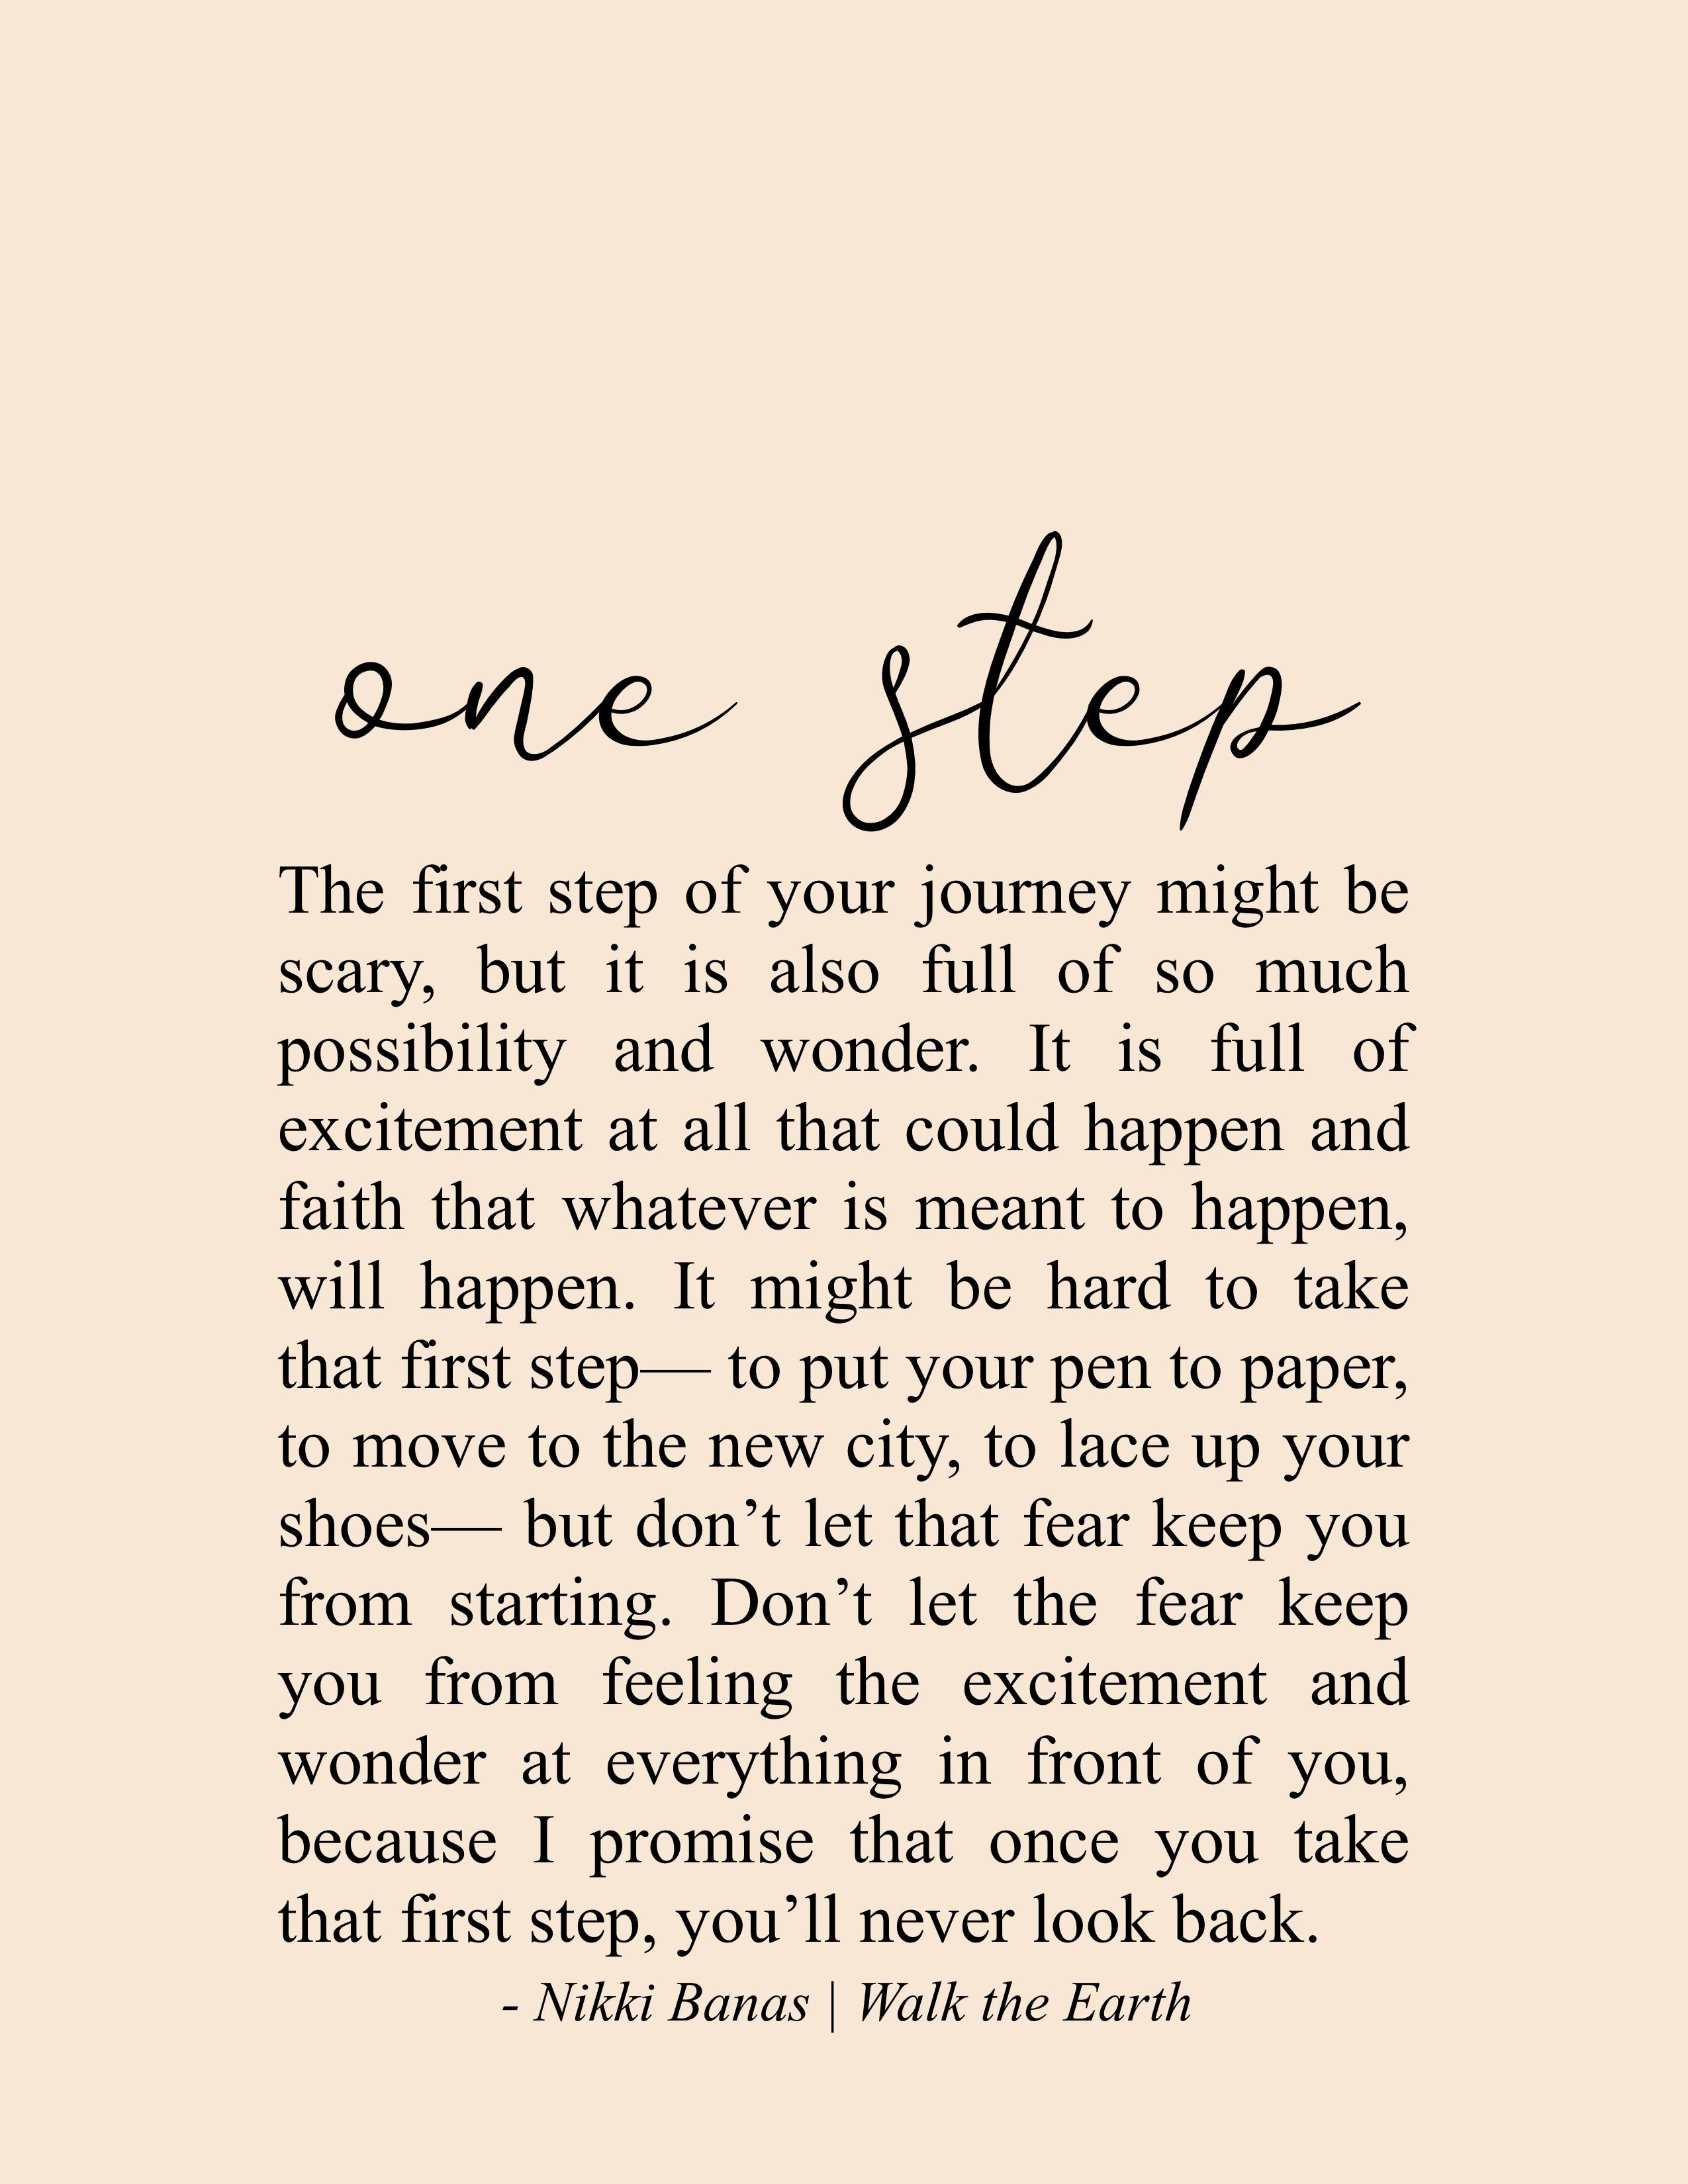 Fresh Start Quotes Beginnings Inspiration Fitness Journey Nikki Banas Walk The Earth Poetry Steps Quotes Start Quotes Self Quotes